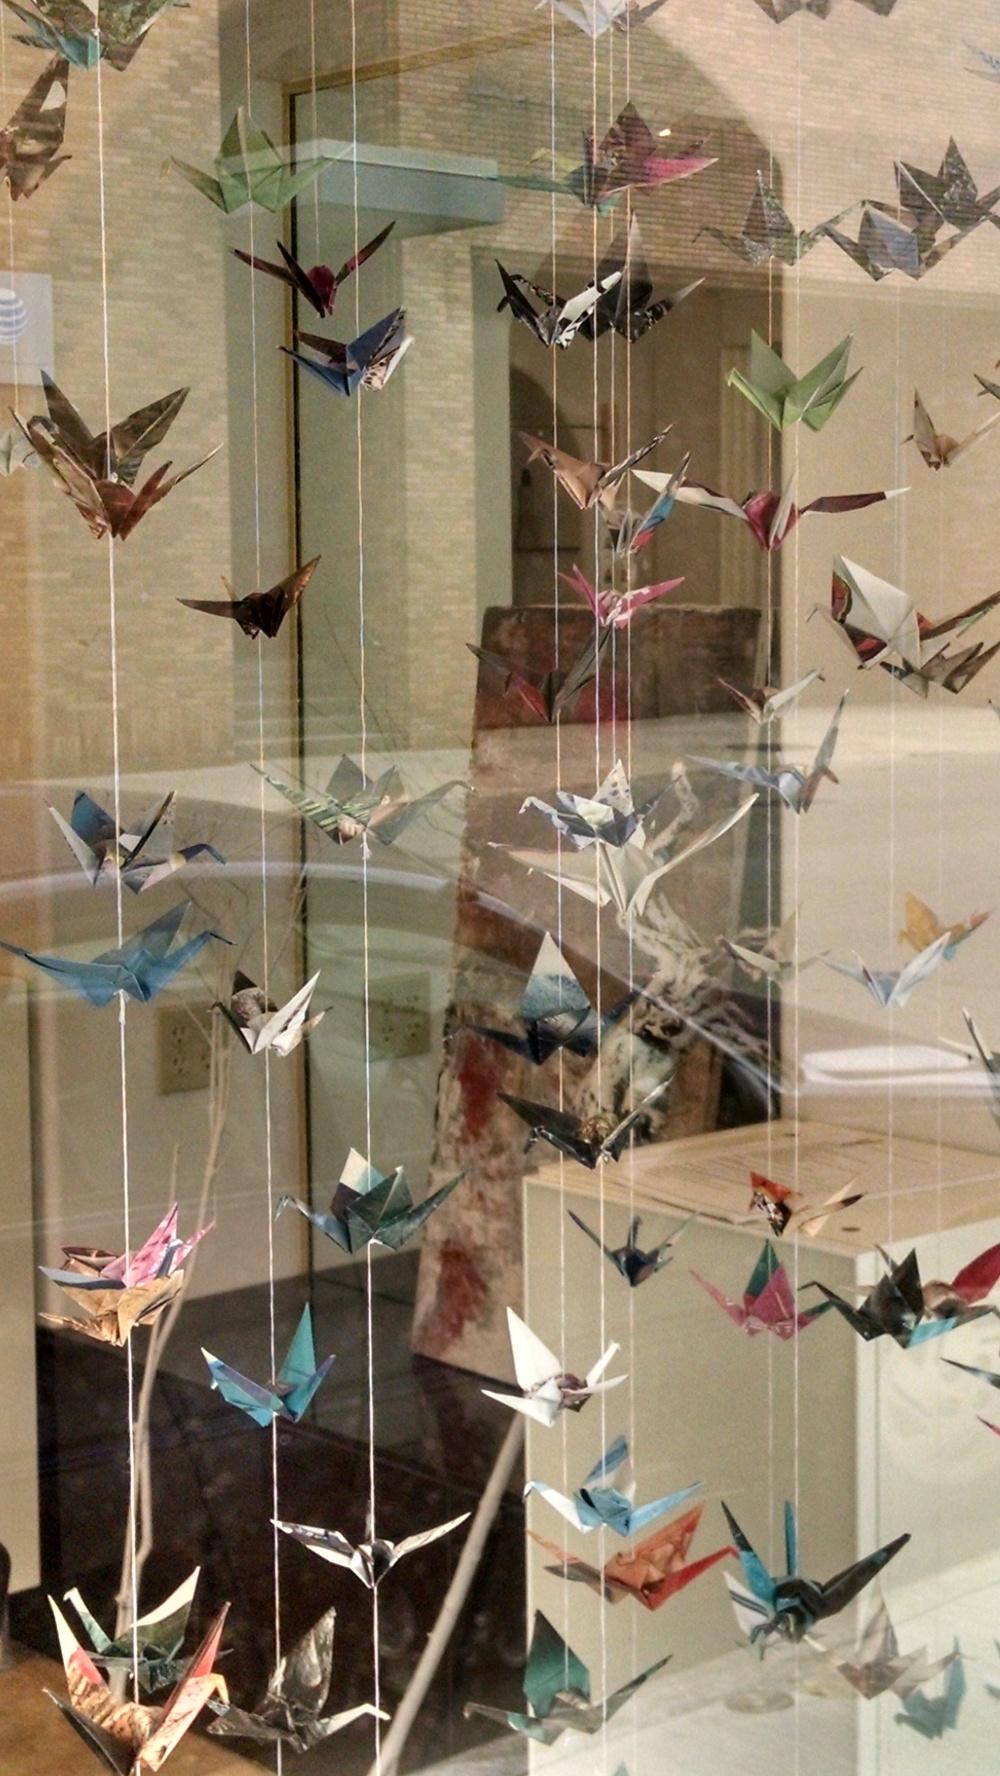 Drue Salon window with commissioned paper cranes